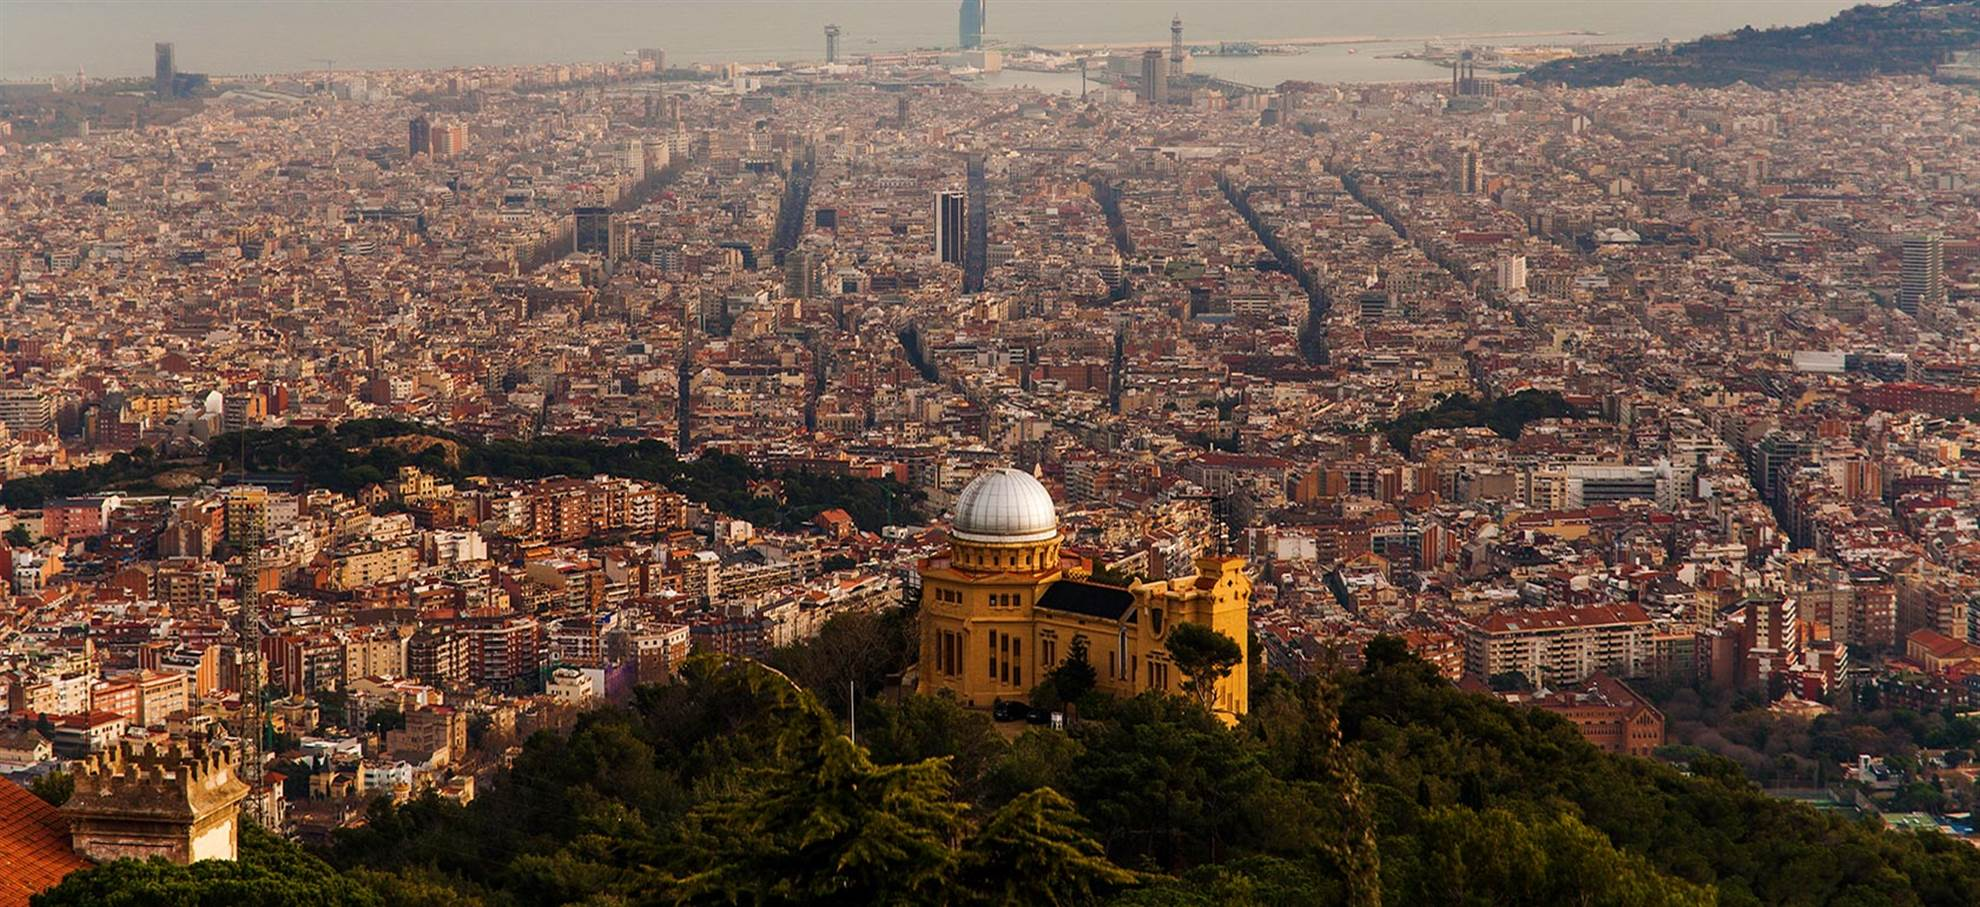 Barcelona Sky Tour - Helikopterflug über Barcelona